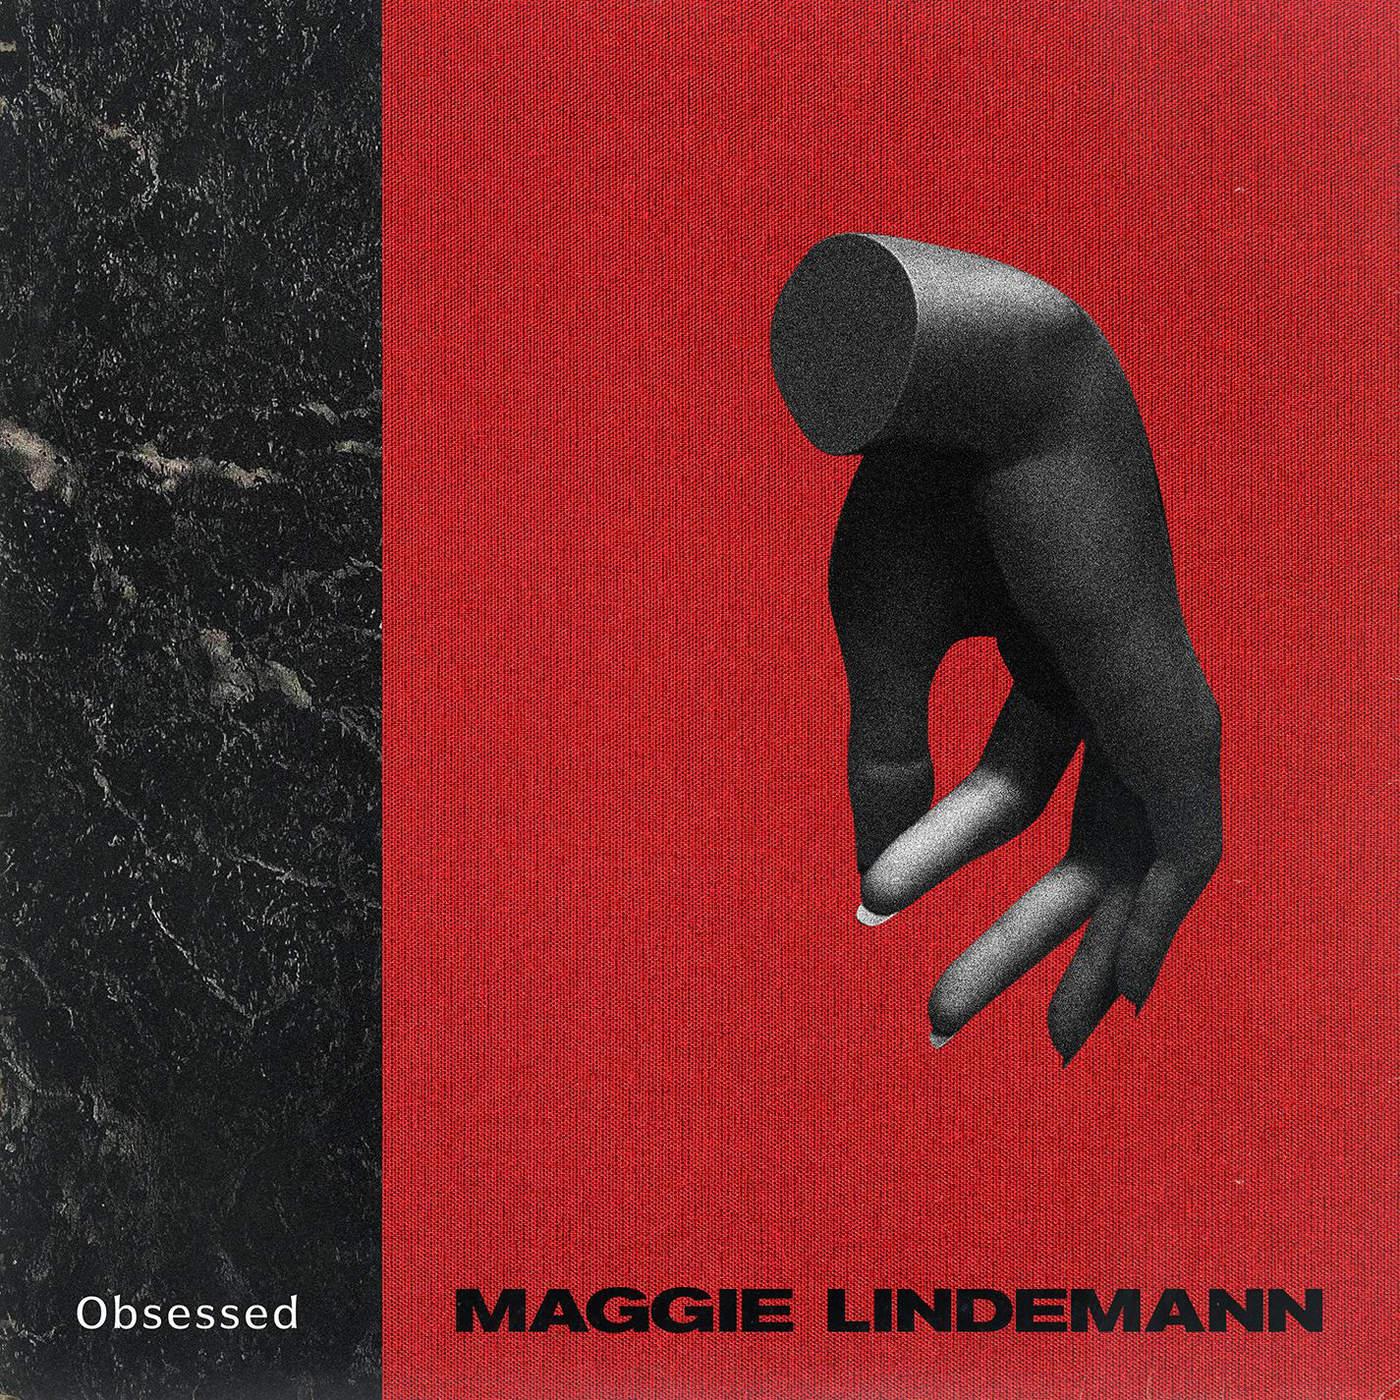 Maggie Lindemann - Obsessed - Single